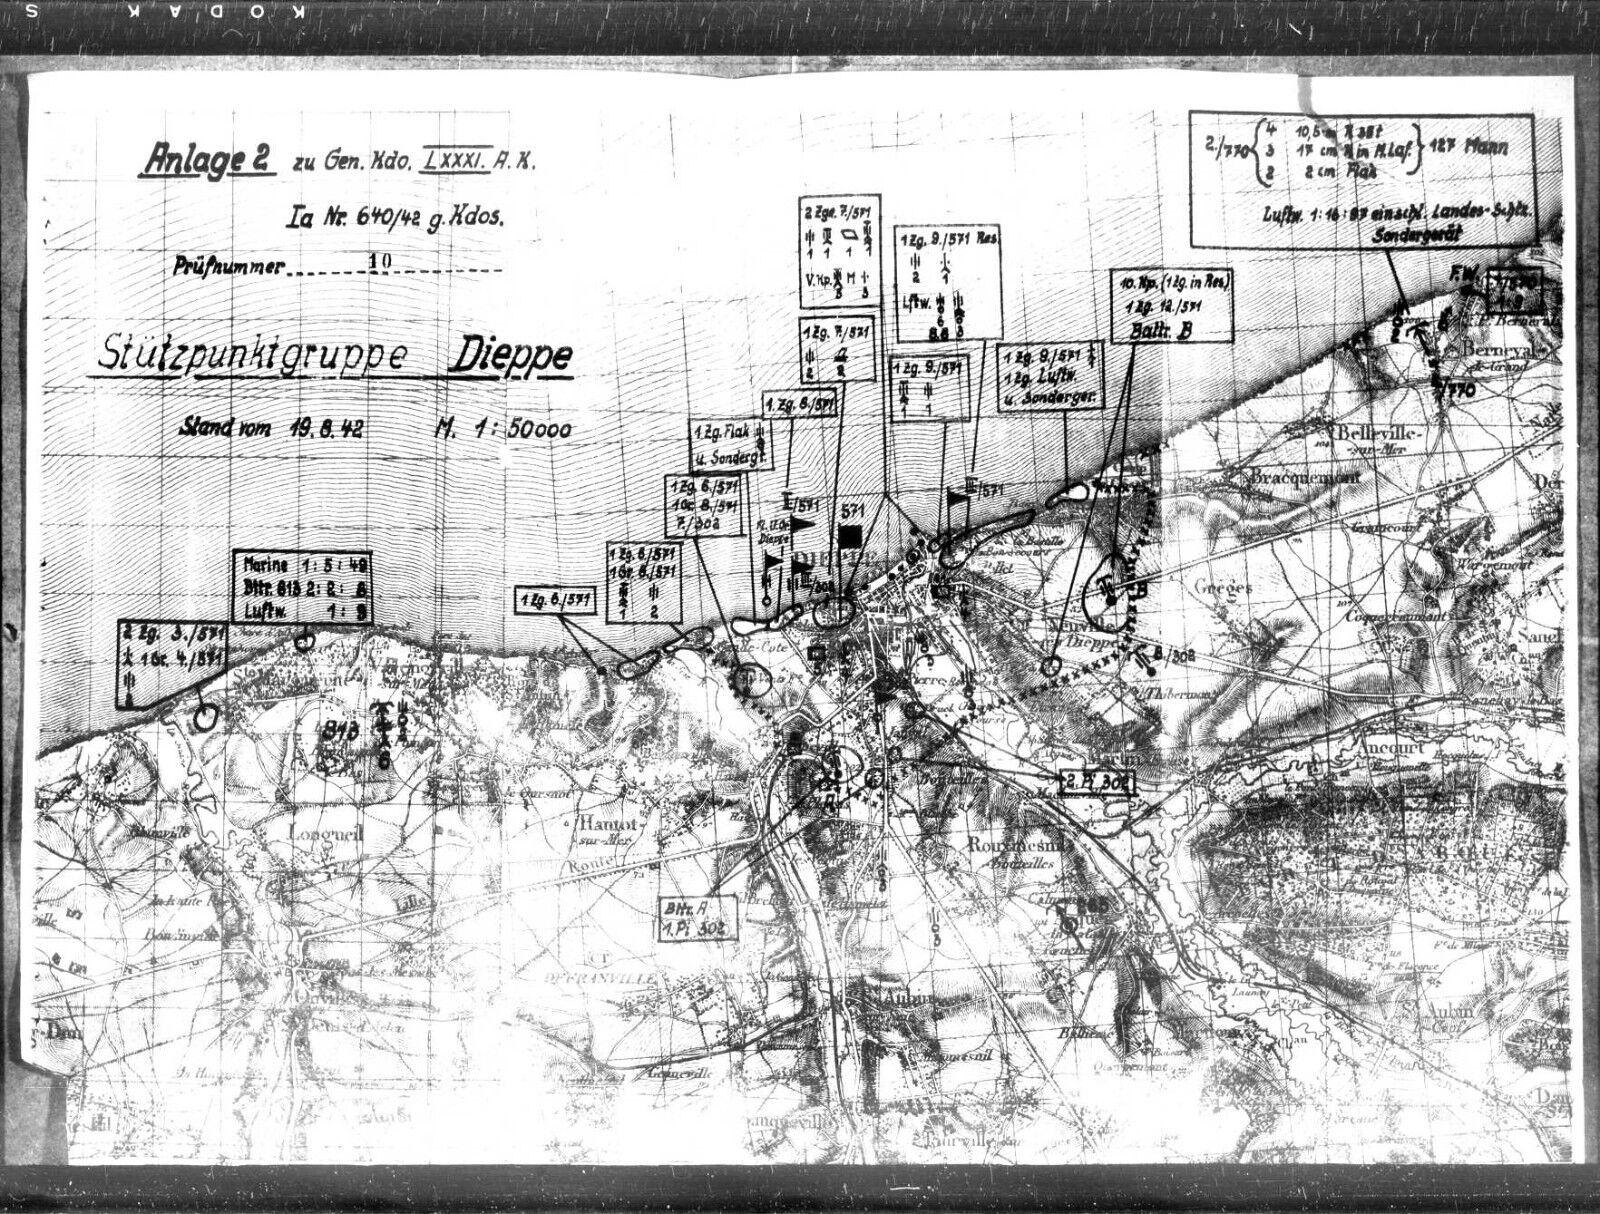 Dieppe Stutzpunktgruppe S-l1600